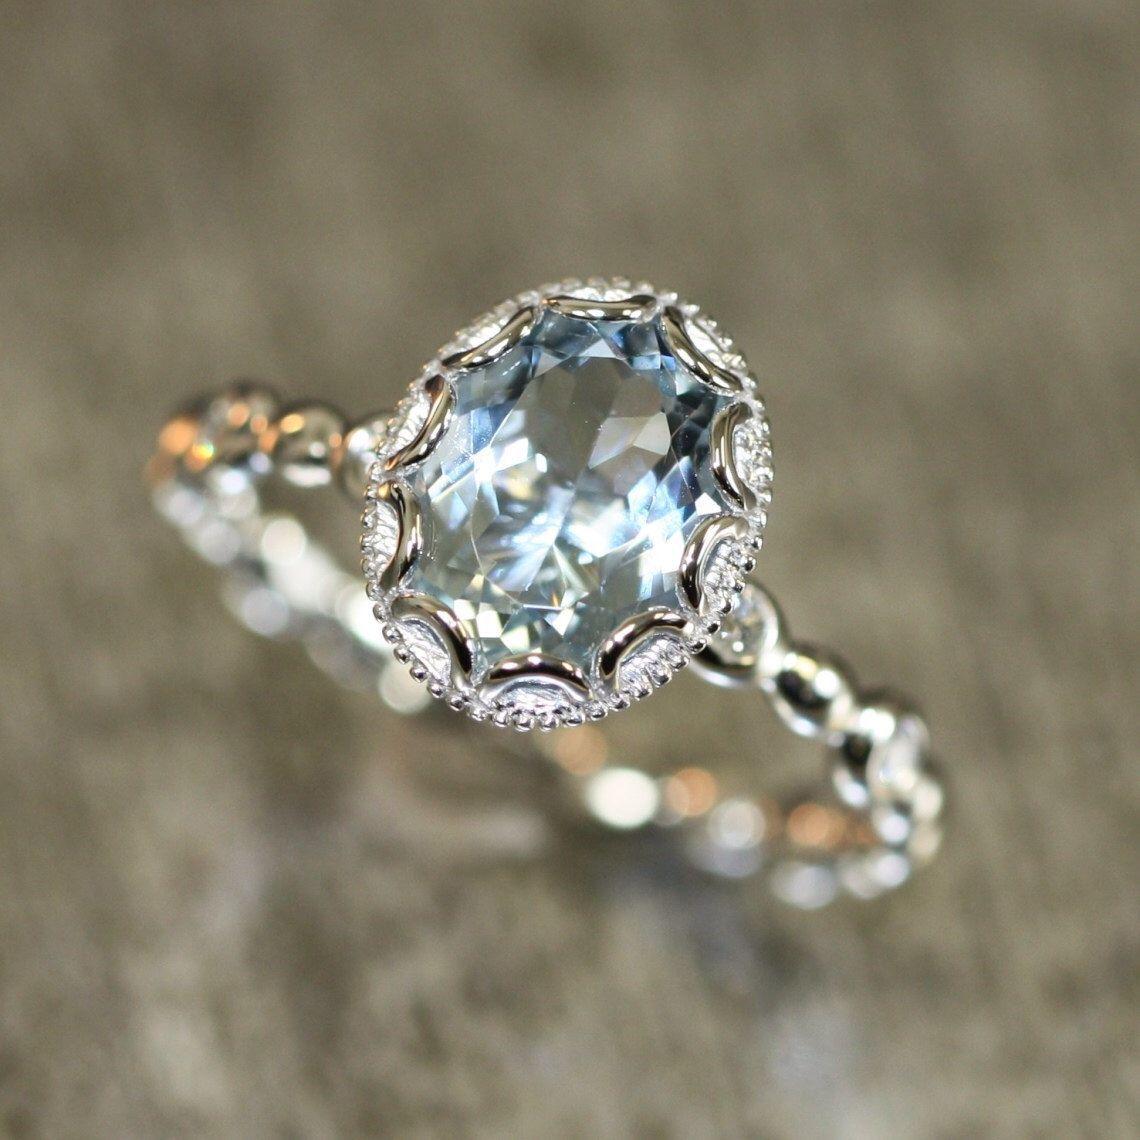 Floral Aquamarine Engagement Ring in 14k White Gold Pebble Diamond Wedding Band 8x6mm Oval Aquamarine Ring March Birthstone Gemstone Ring